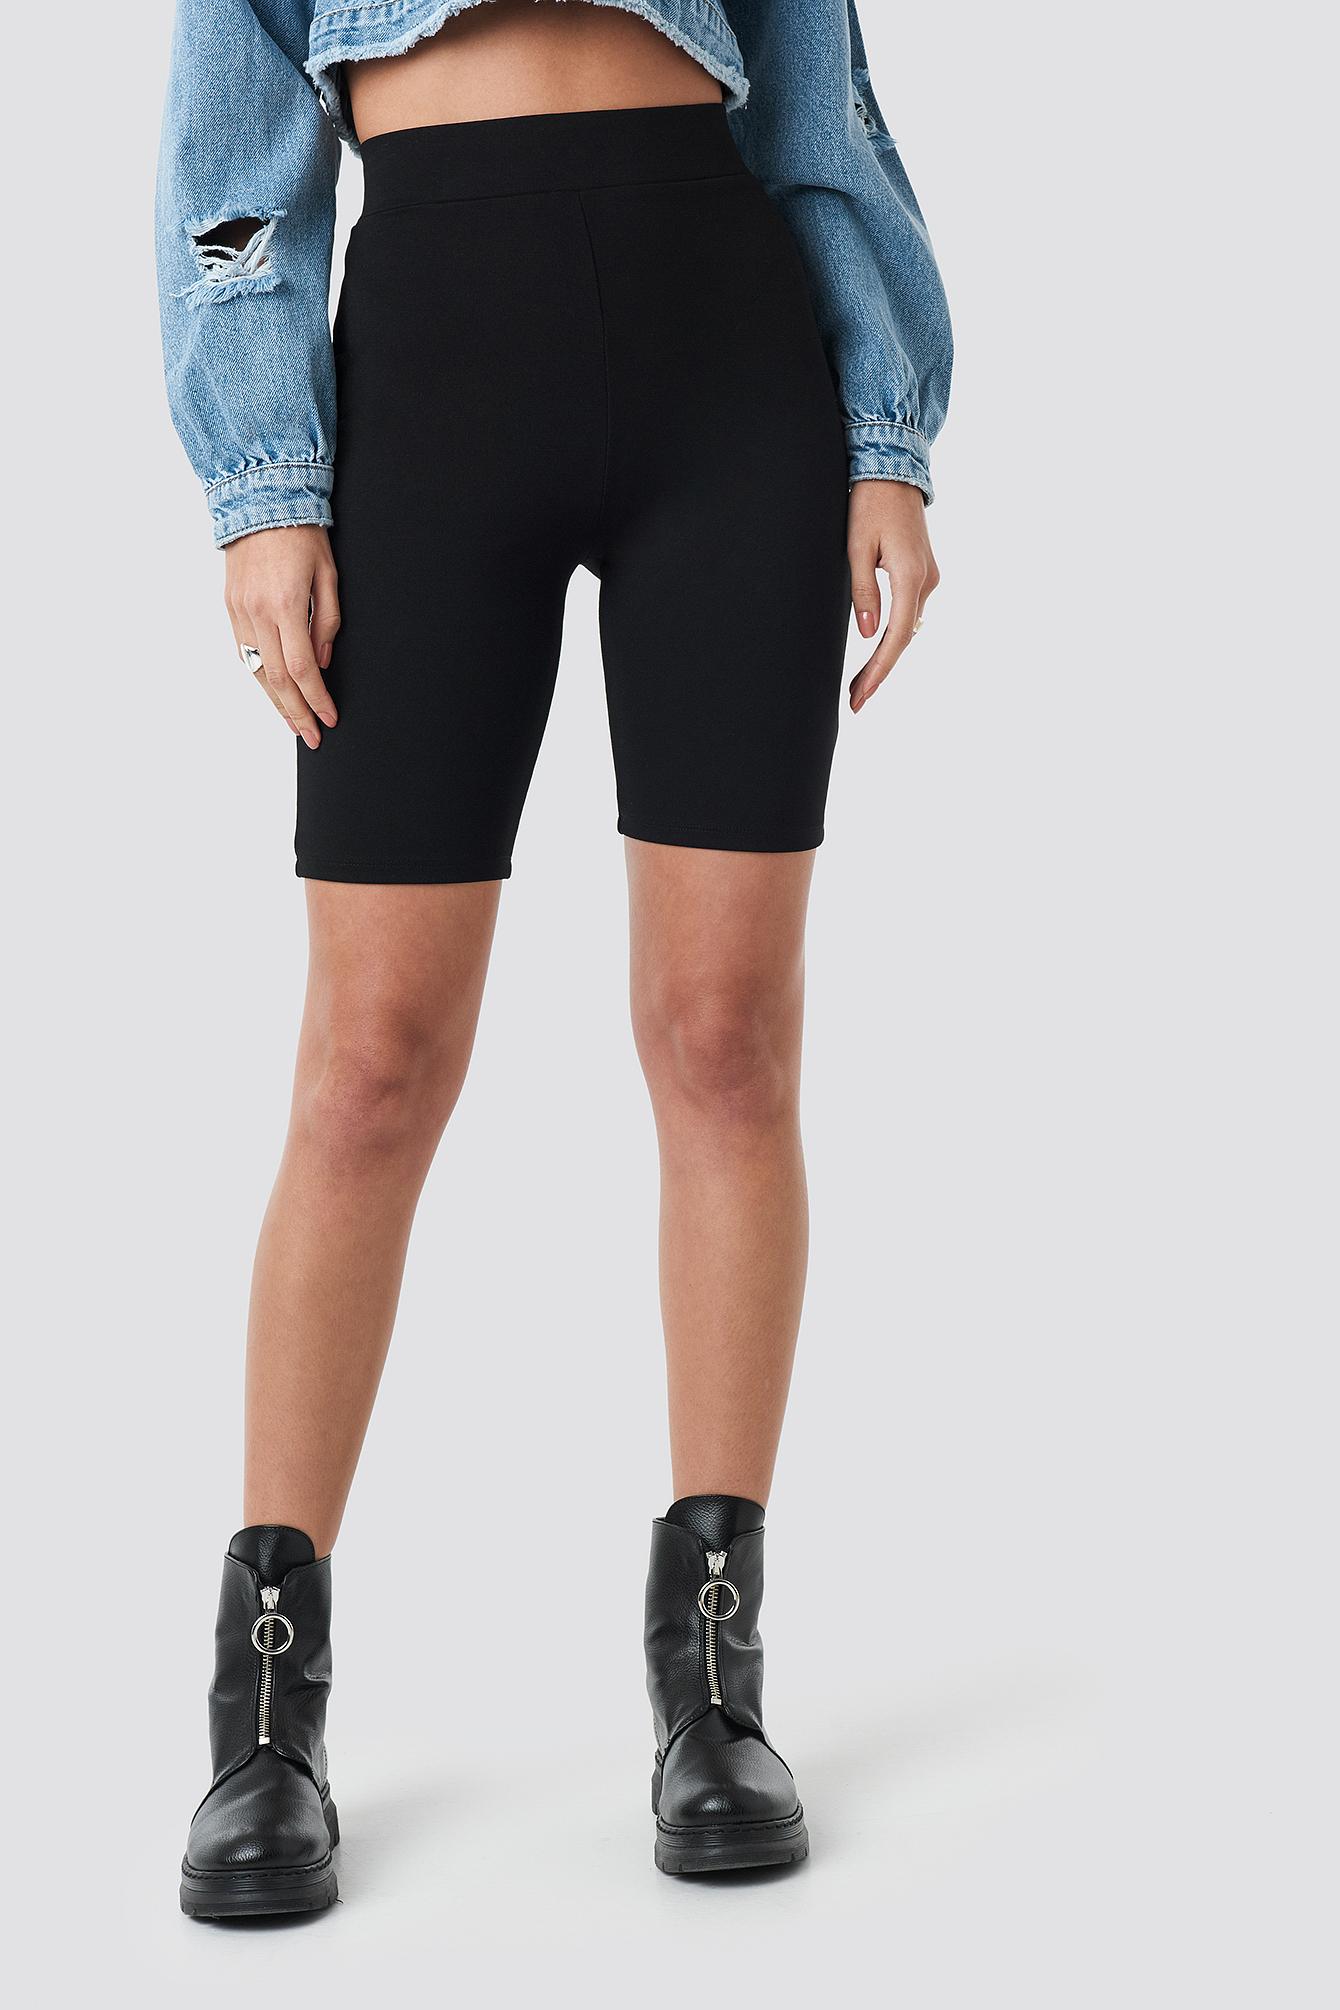 Highwaist Slim Jersey Shorts NA-KD.COM